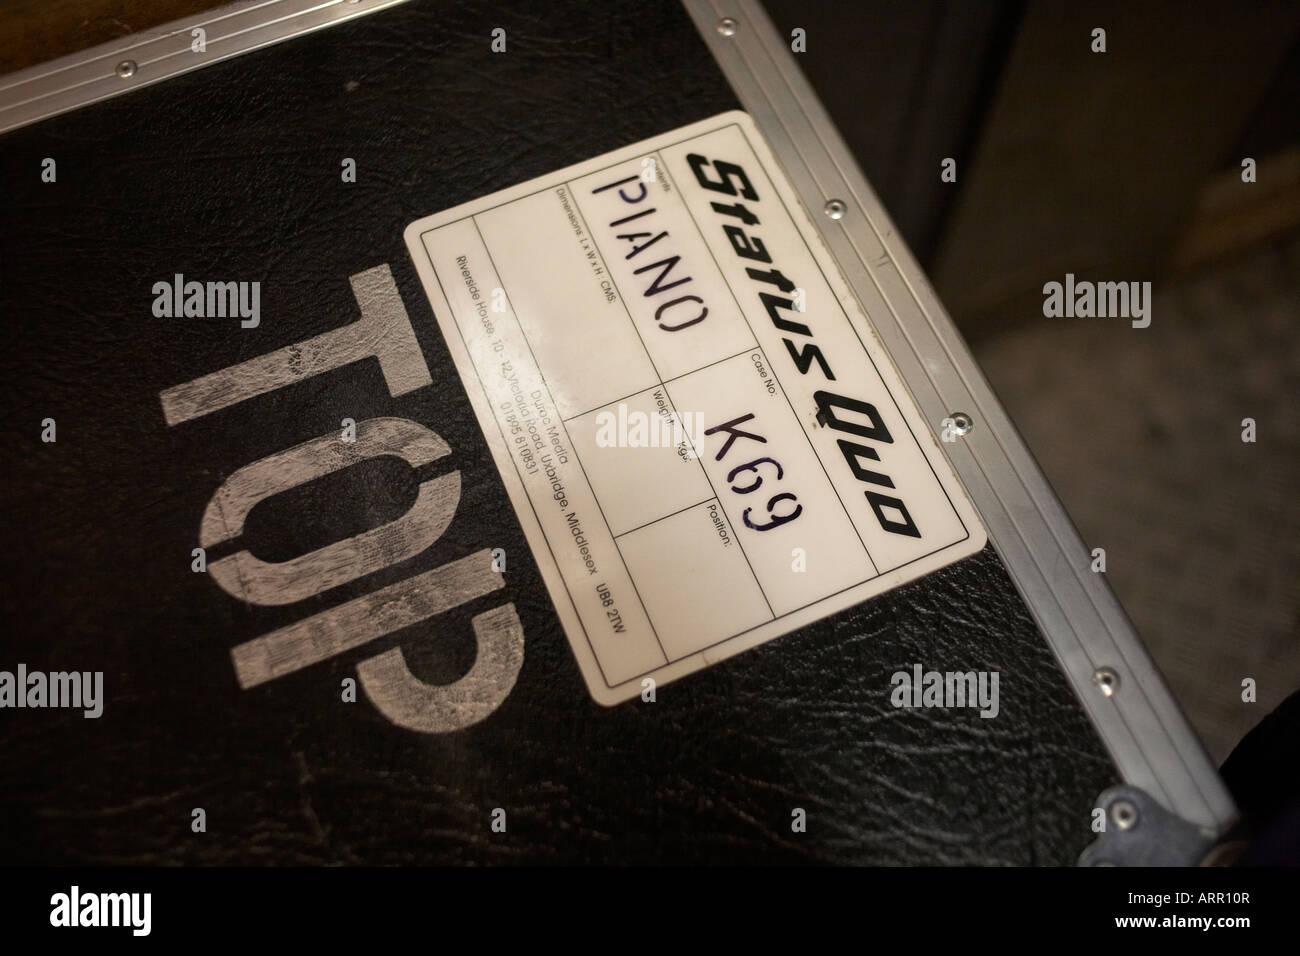 Roadie Stock Photos & Roadie Stock Images - Alamy